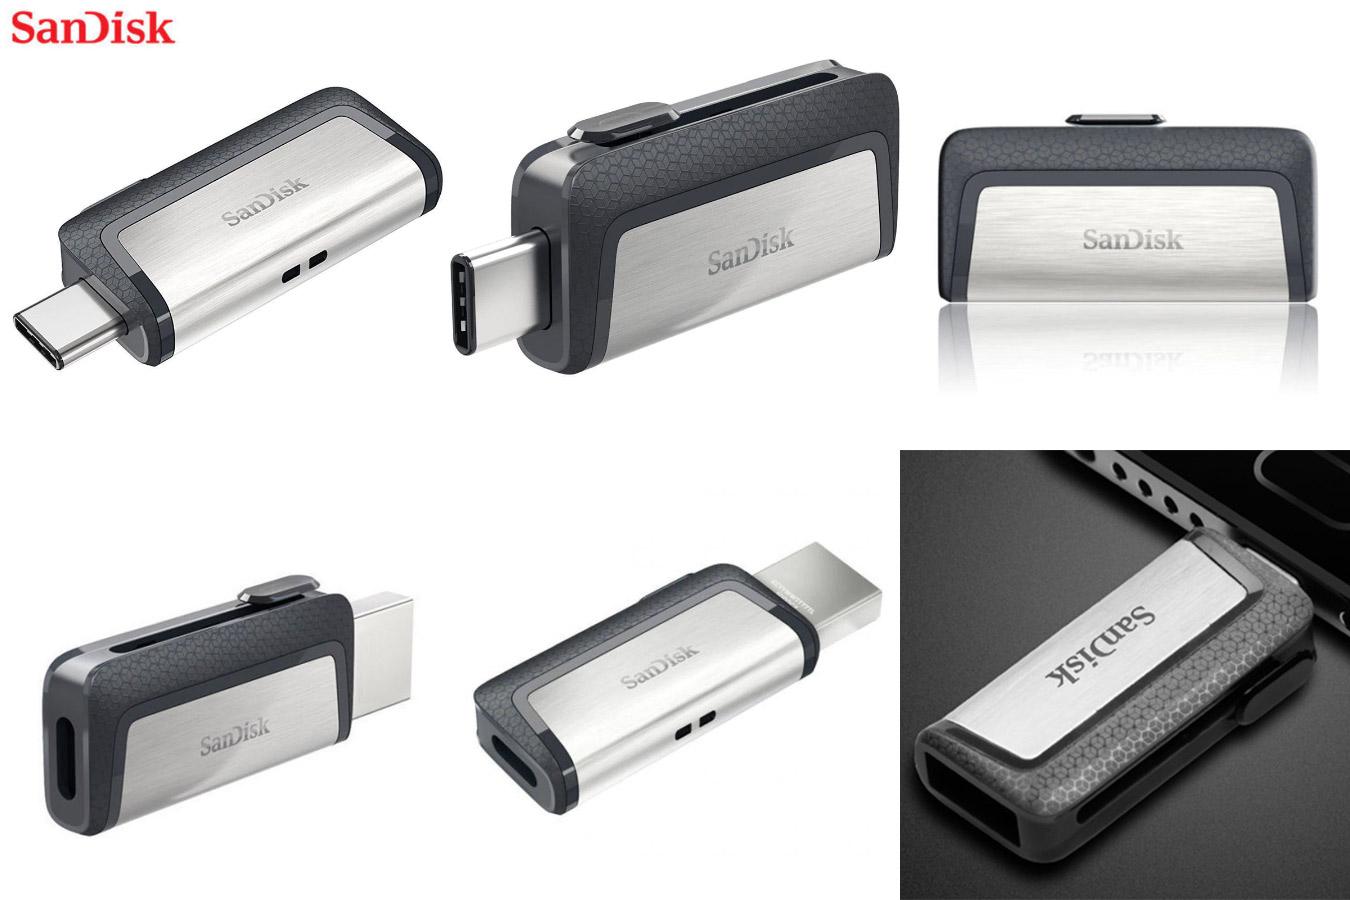 Быстрая двойная флешка SanDisk USB Flash drive 3.1